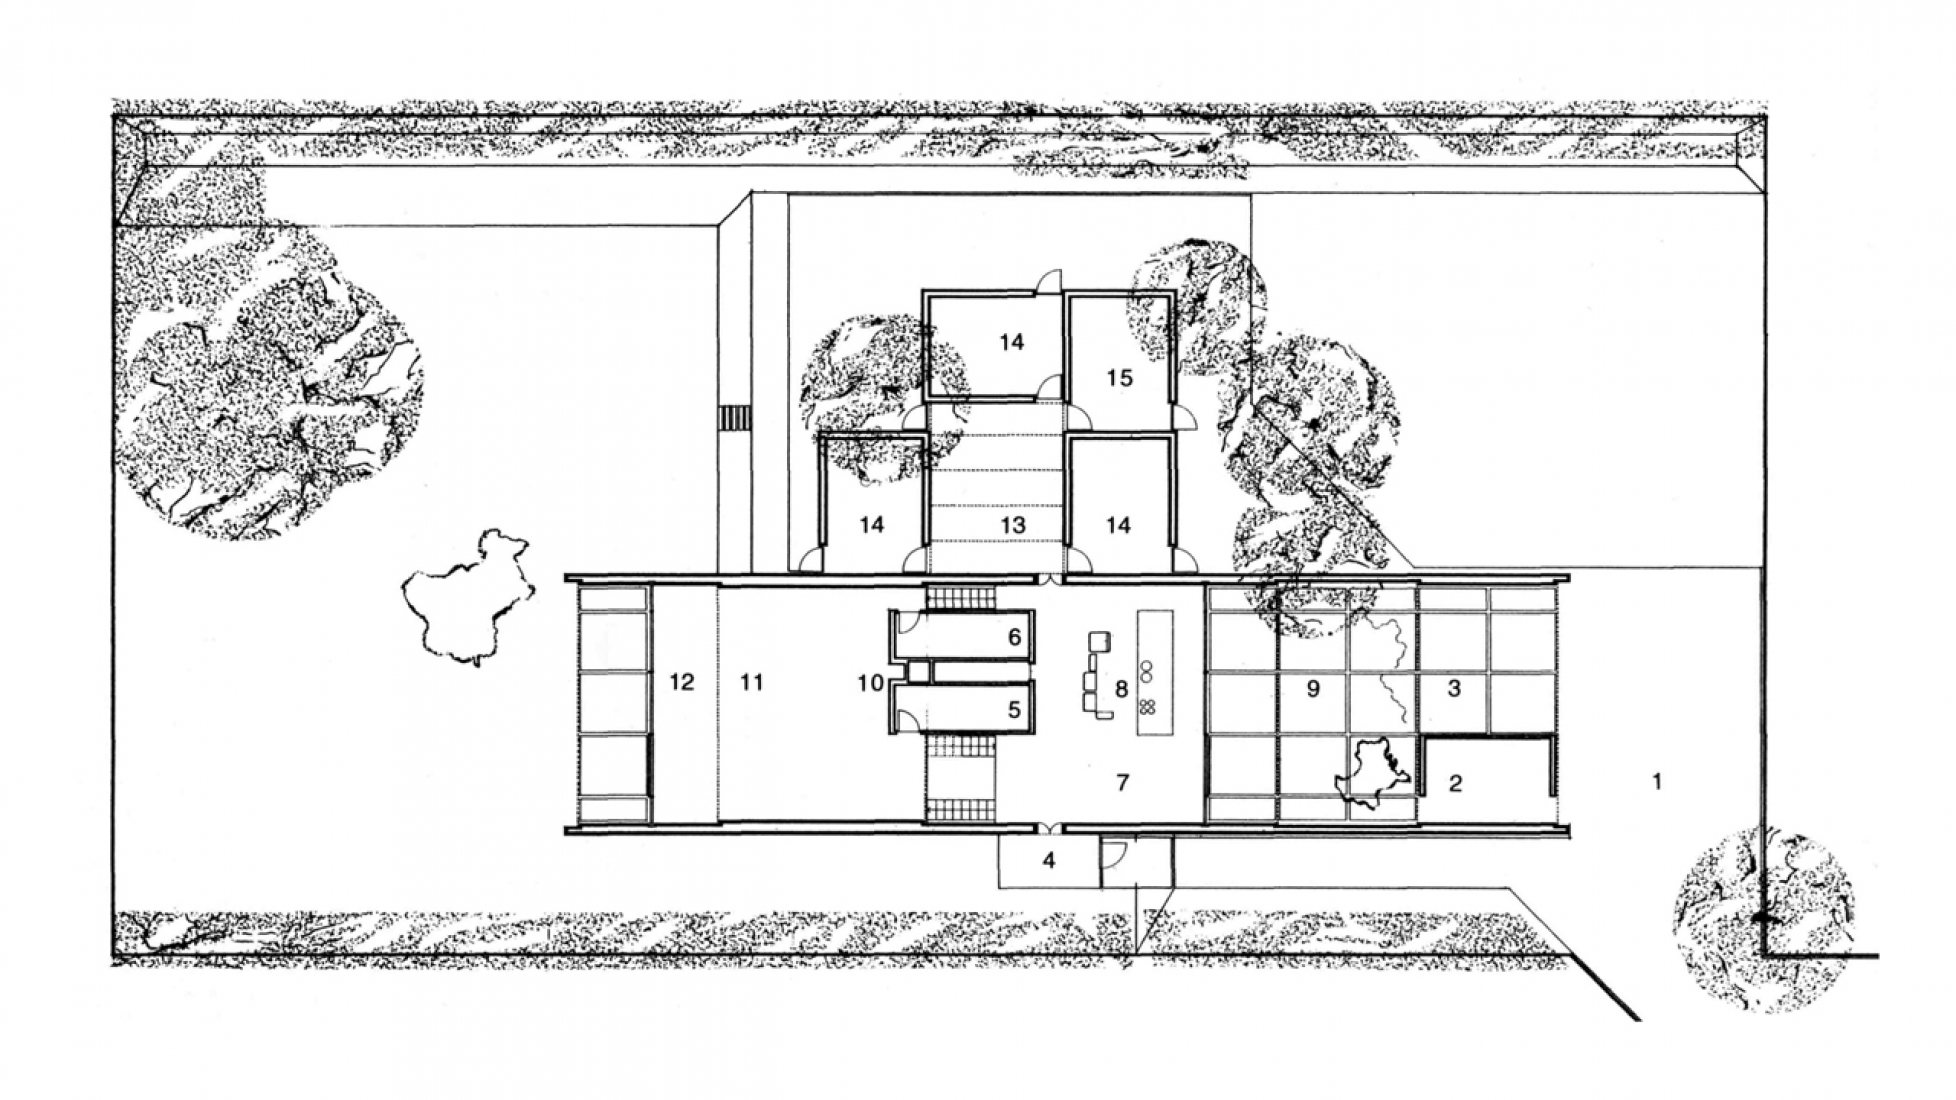 Planta baja. Casa Holscher por Knud Holscher, Holte, Dinamarca, 1971.